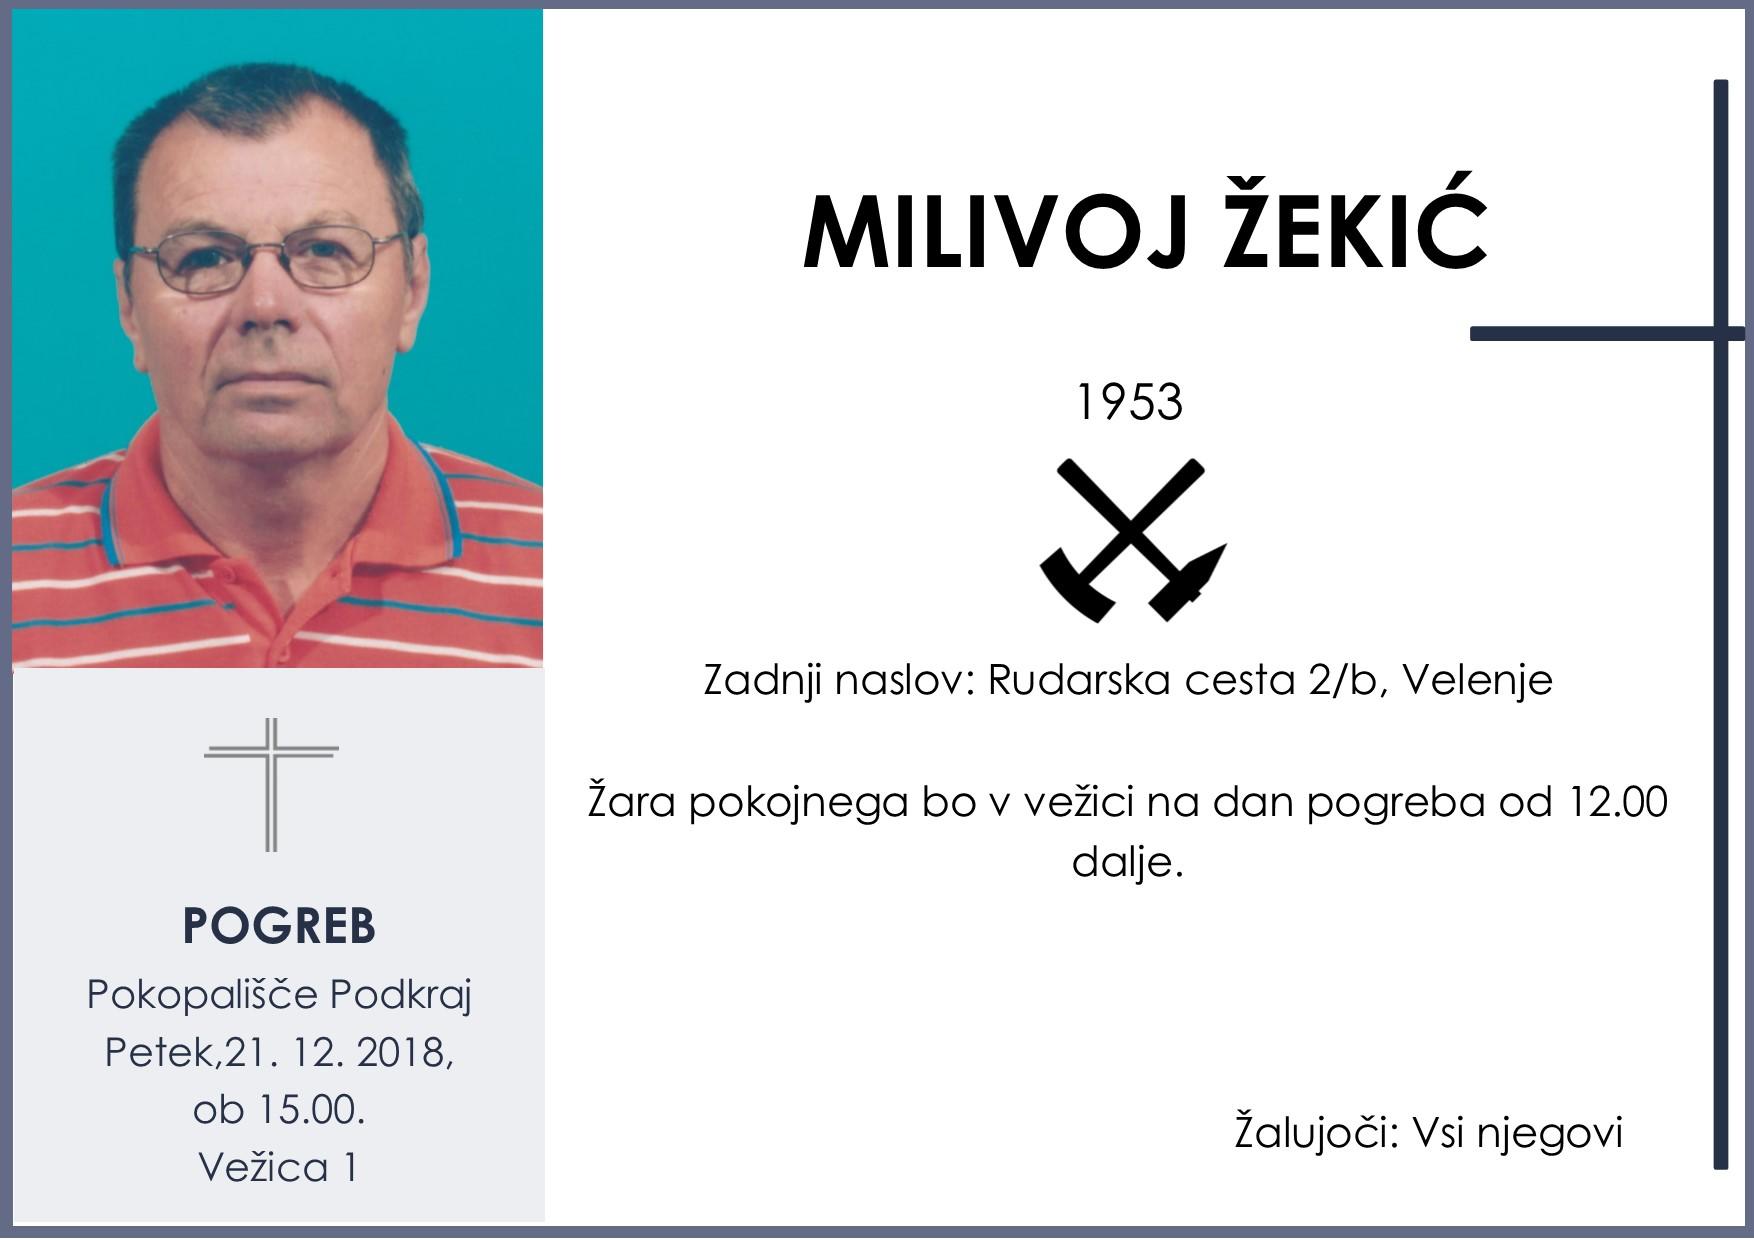 MILIVOJ ŽEKIĆ, Podkraj, 21. 12. 2018